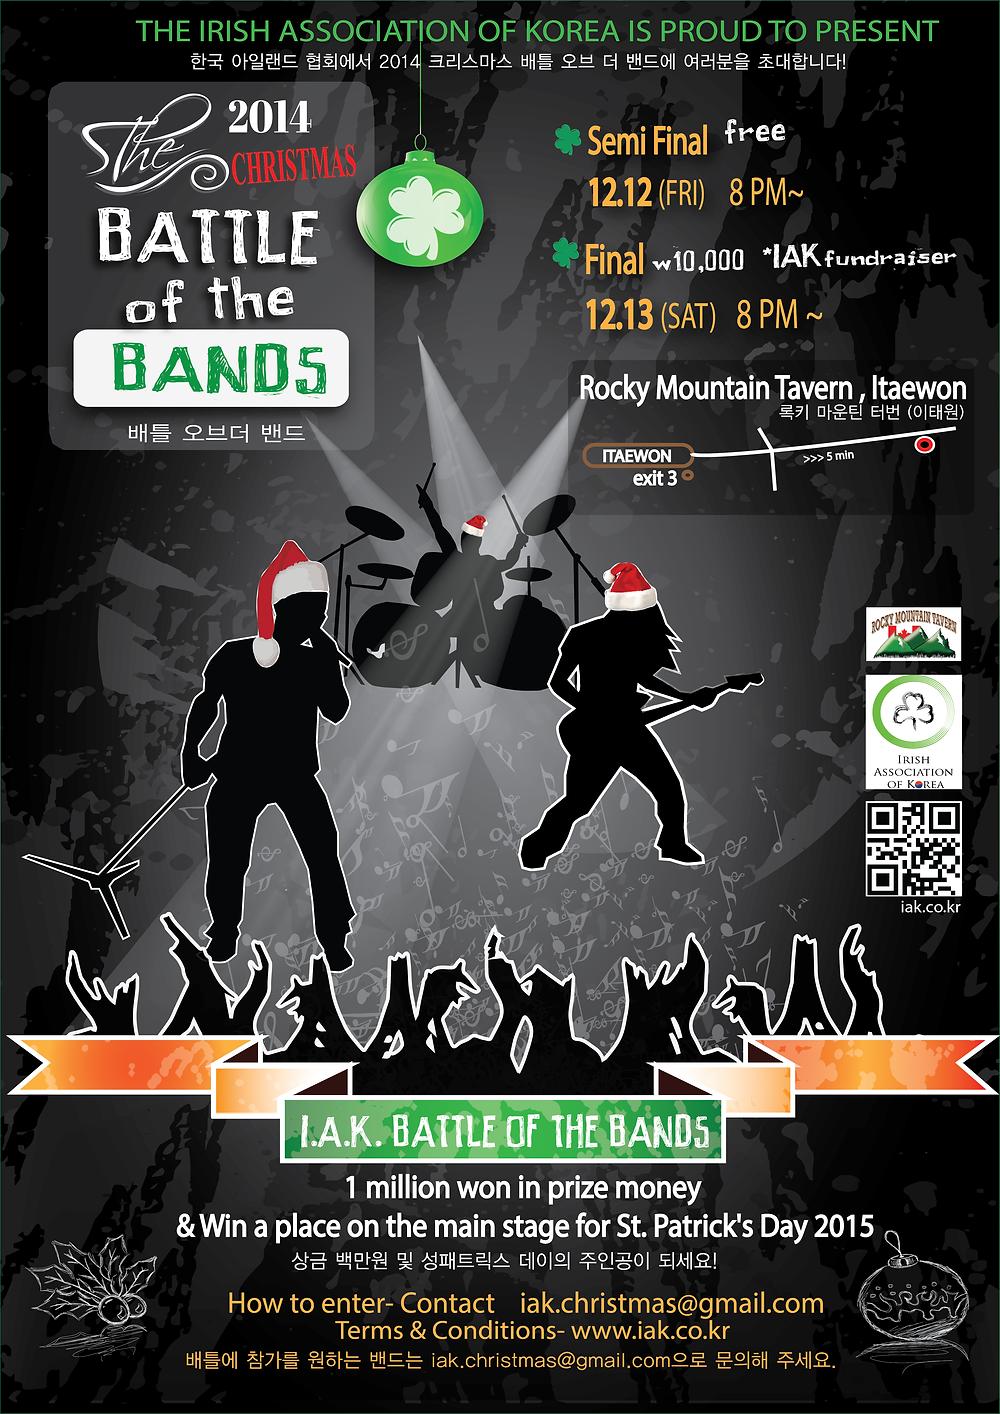 IAK Christmas band battle